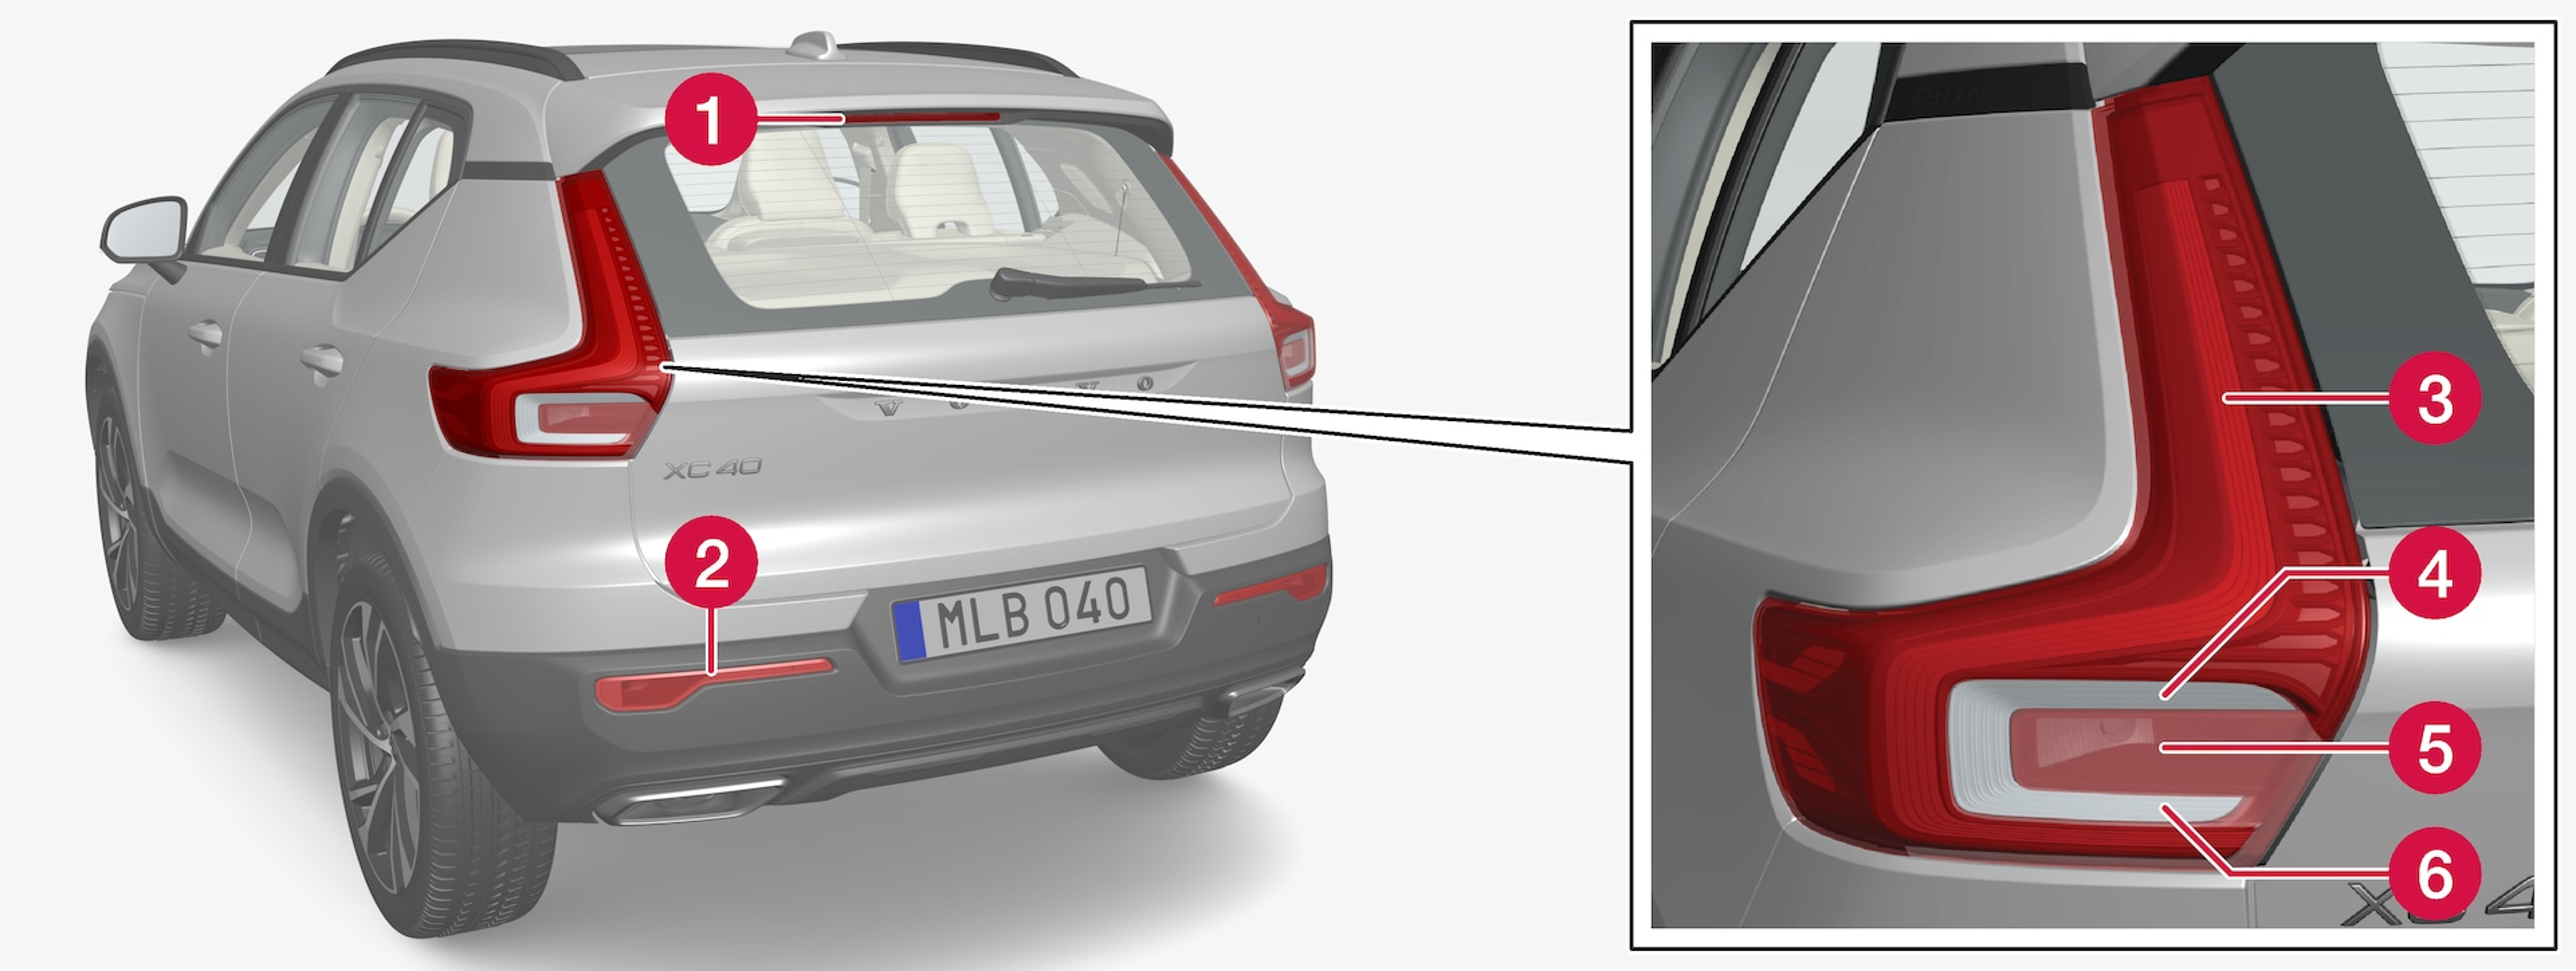 P6-1746-XC40-Rear light positions